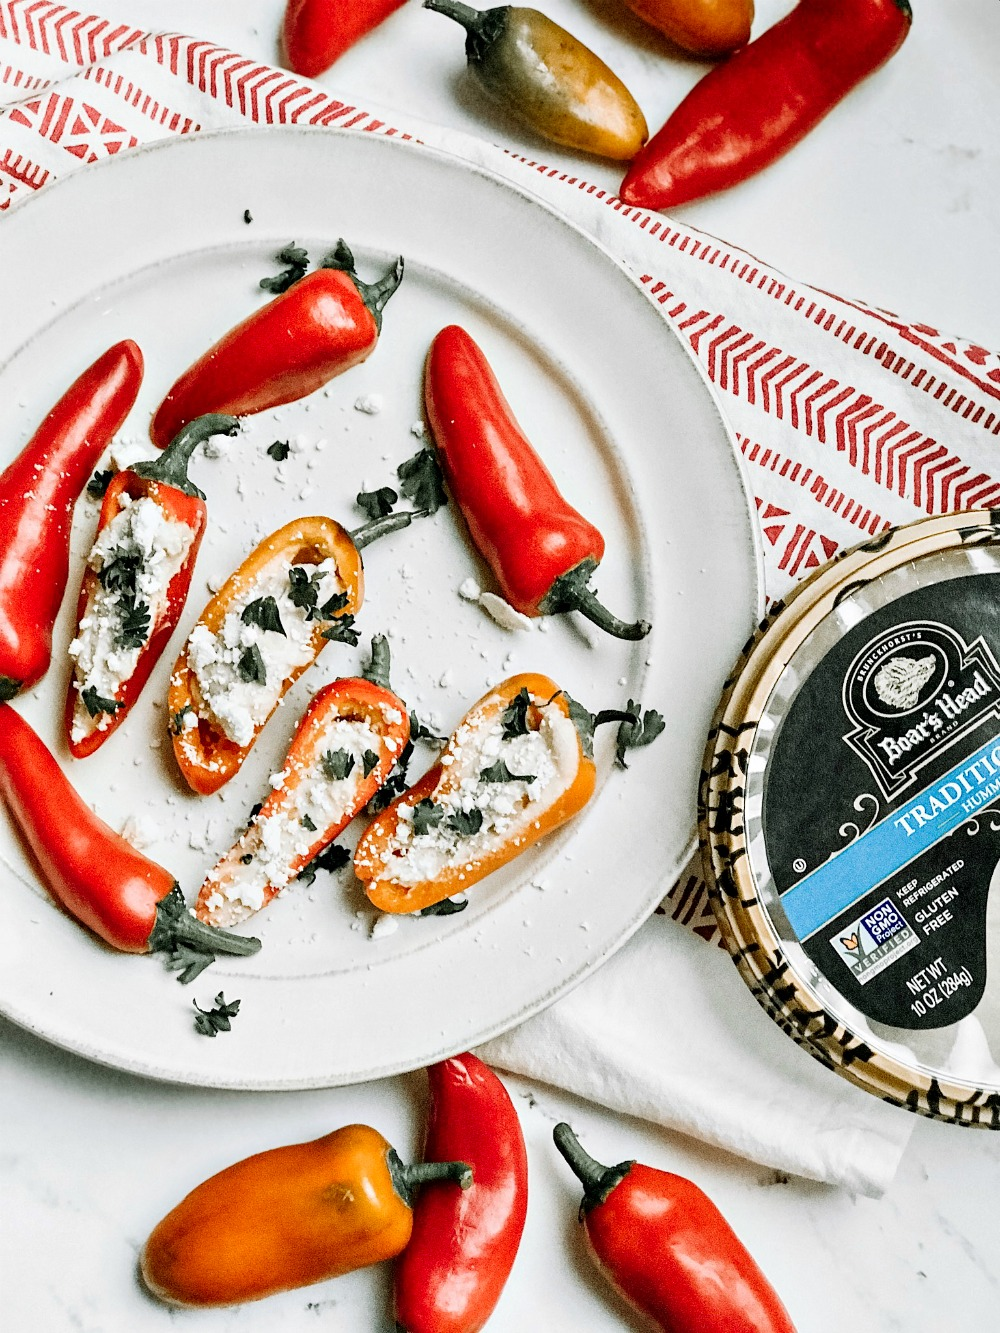 hummus stuffed peppers recipe appetizer